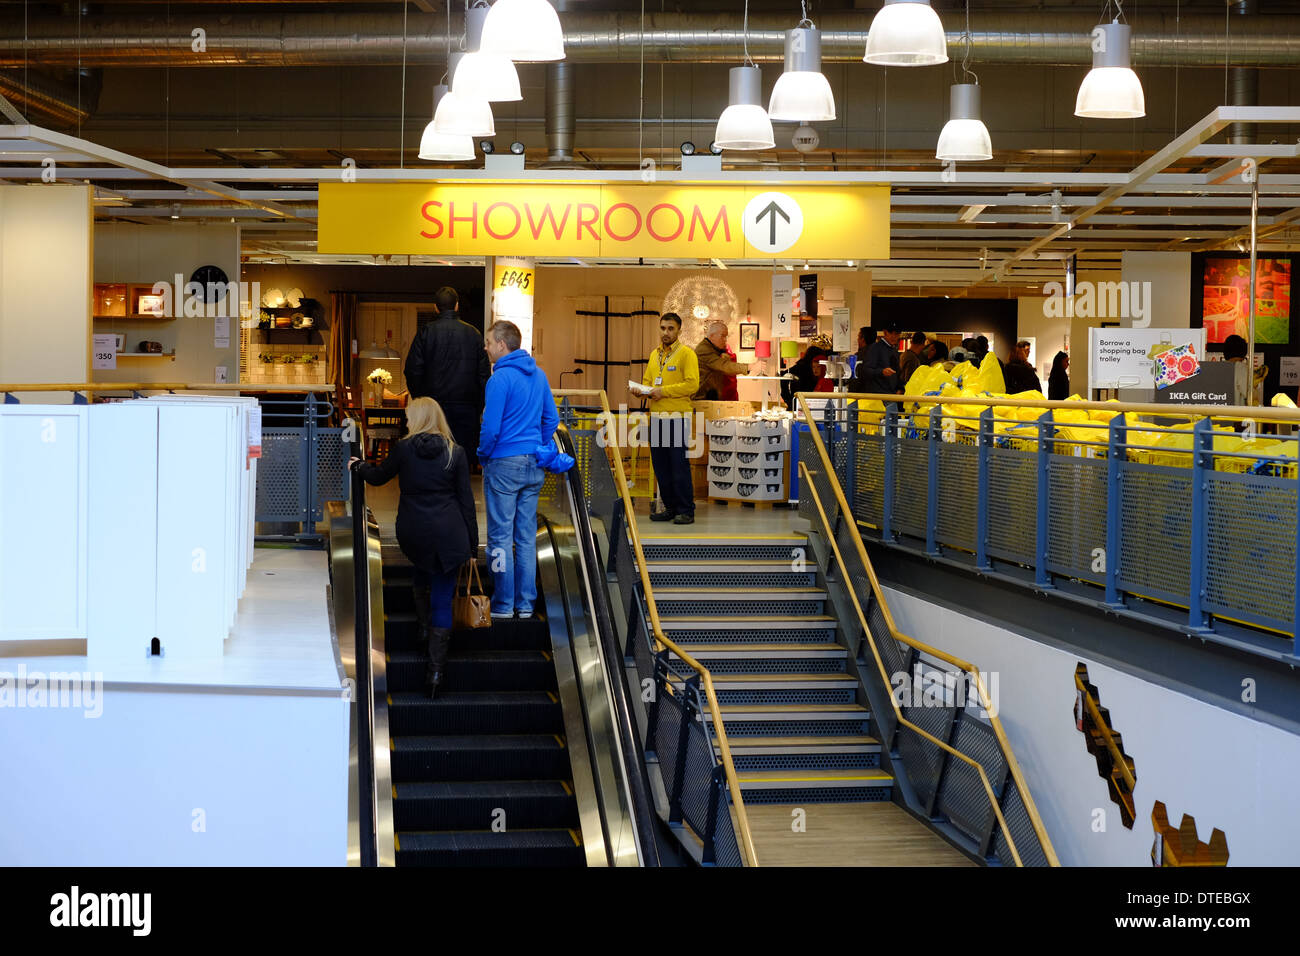 Shoppers On An Escalator At Ikea In Milton Keynes Stock Photo Royalty Free Image 66699274 Alamy